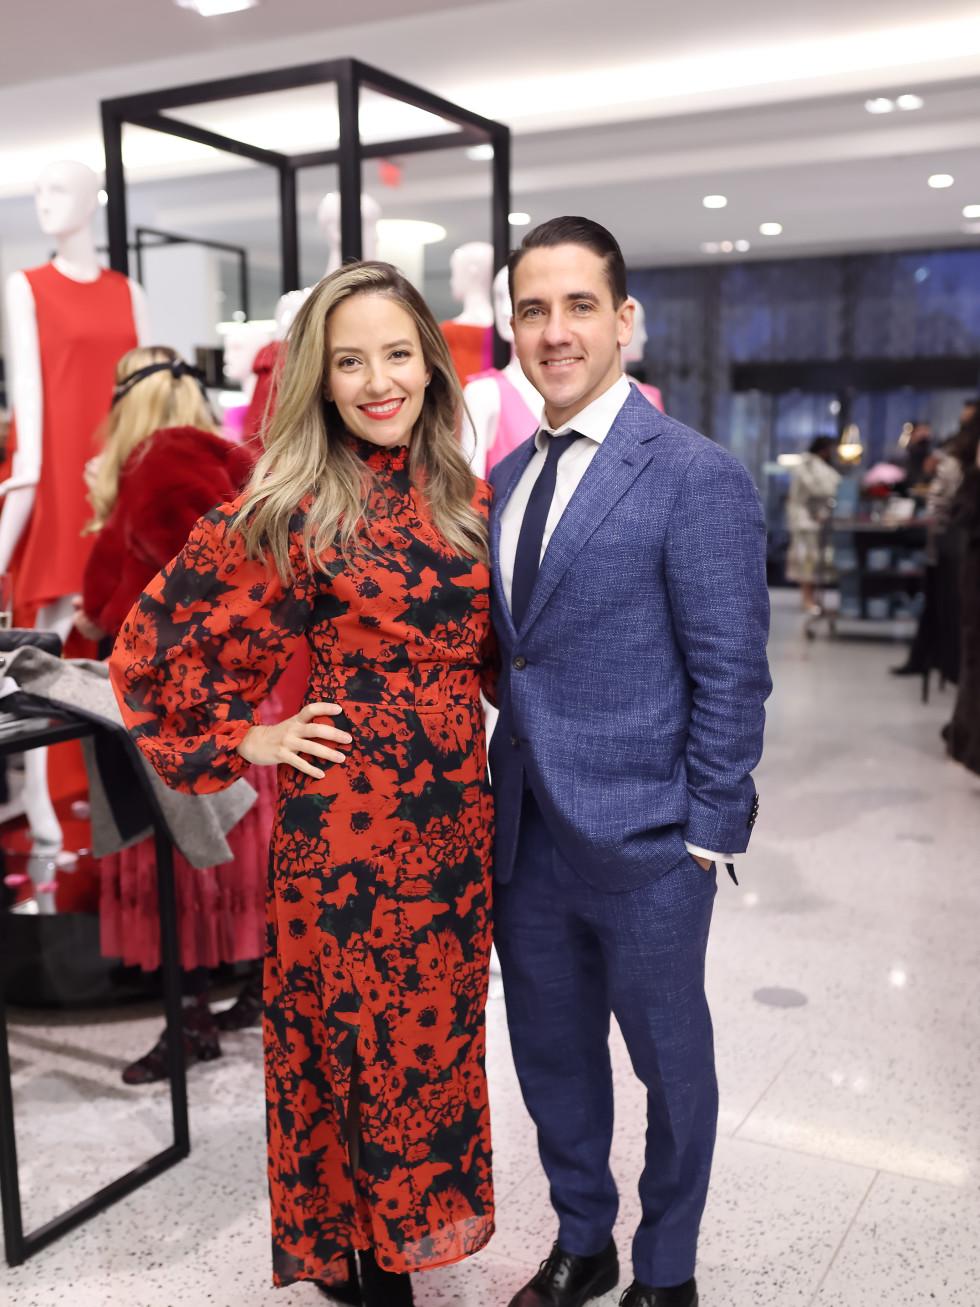 LCA Houston Winter Spring Power Couples 2021 Correa Mónica Medina and Ricardo Flores representing Correra Family Foundation